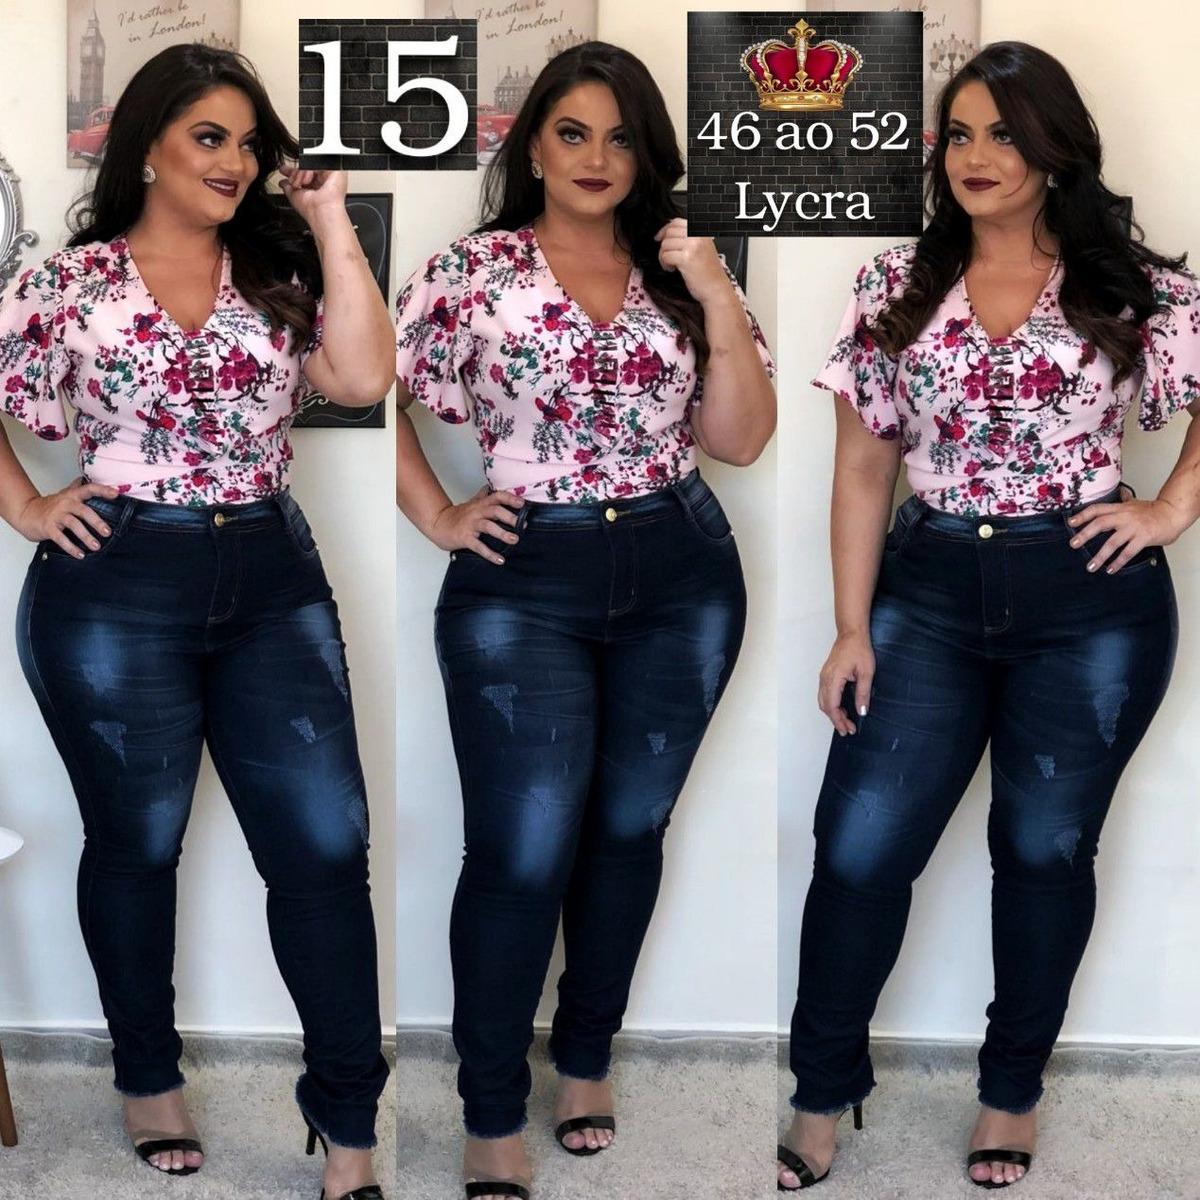 ec8529152 kit 2 calças jeans plus size cintura alta tendência gg ref 1. Carregando  zoom.